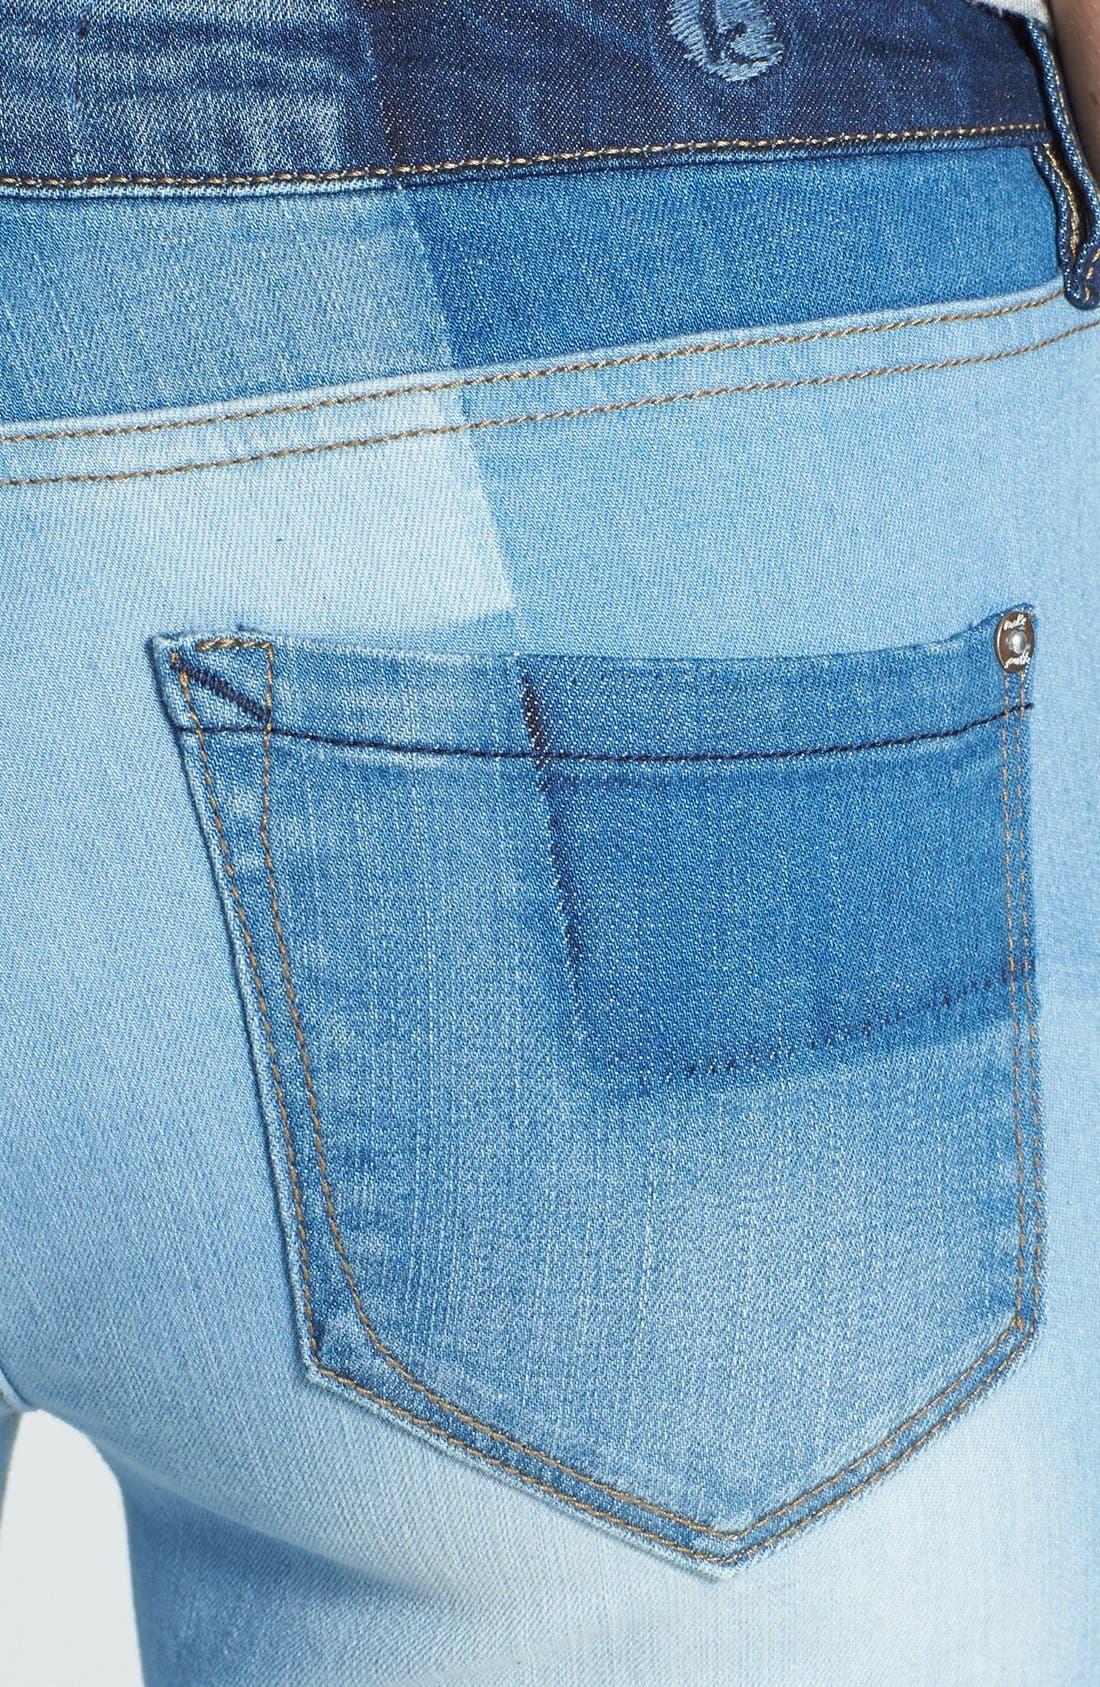 Alternate Image 3  - kensie 'Ankle Biter' Colorblock Skinny Jeans (Vintage Twister)